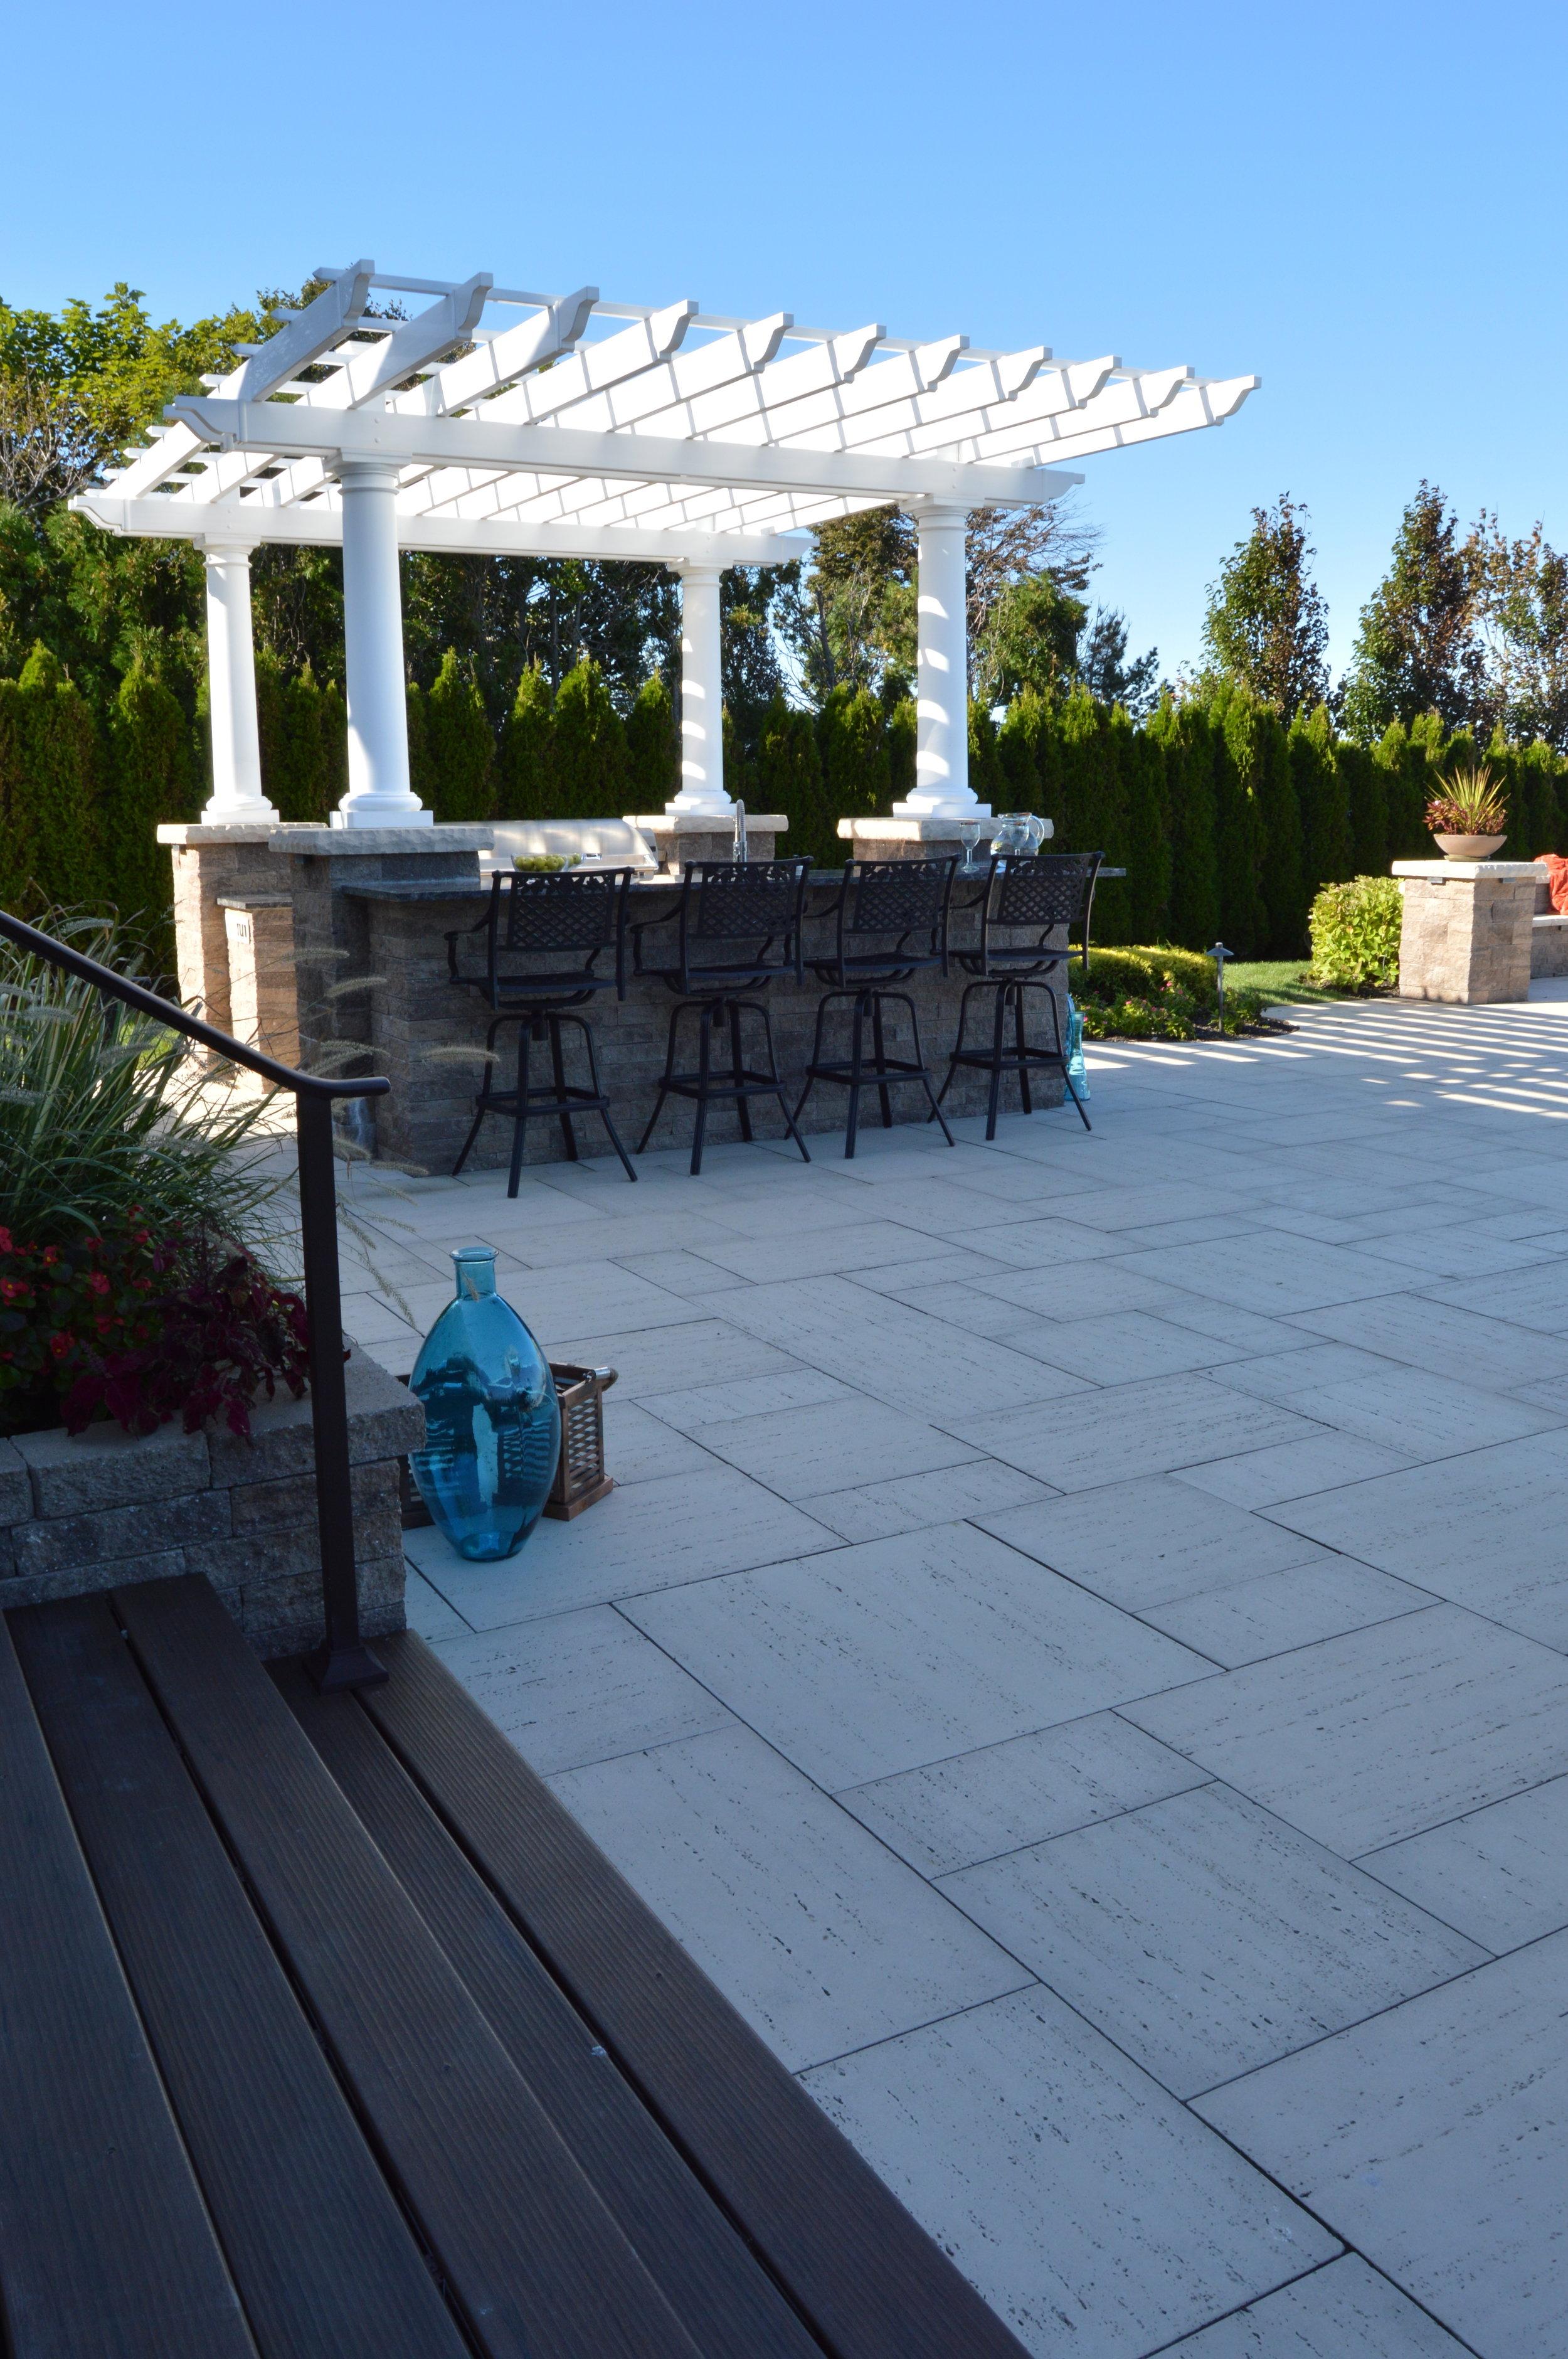 Four Innovative Backyard Design Ideas to Create Shade for Your Glen Cove, NY Patio